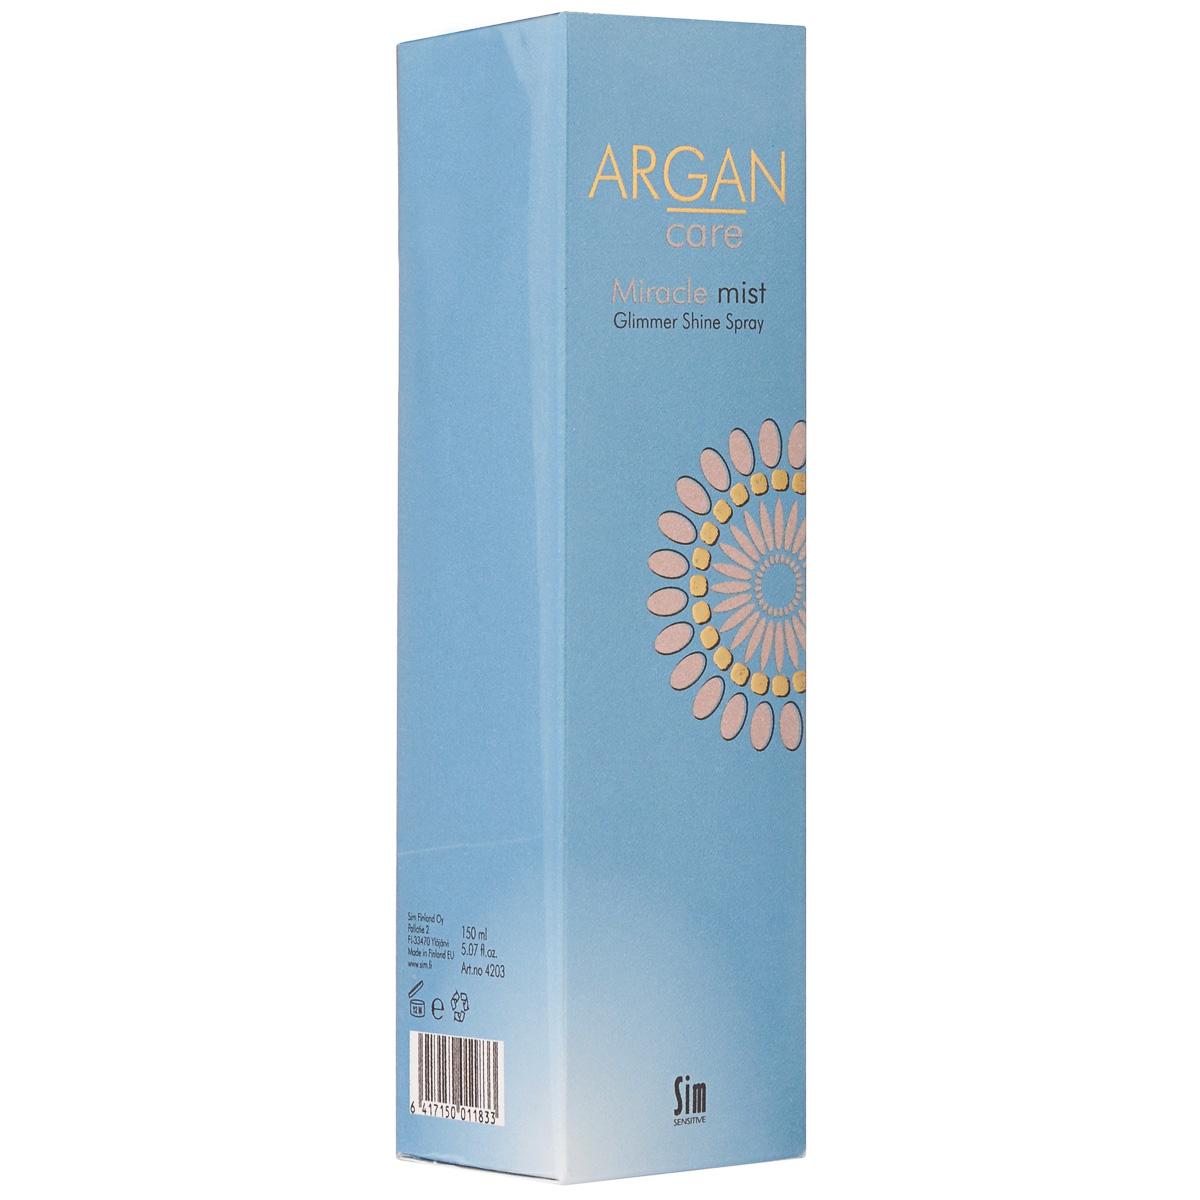 SIM SENSITIVE Спрей-блеск для волос средней фиксации Argan Care Miracle Mist Glimmer Shine Spray Миракл Мист Глиммер Шайн 150 мл (Sim Sensitive)